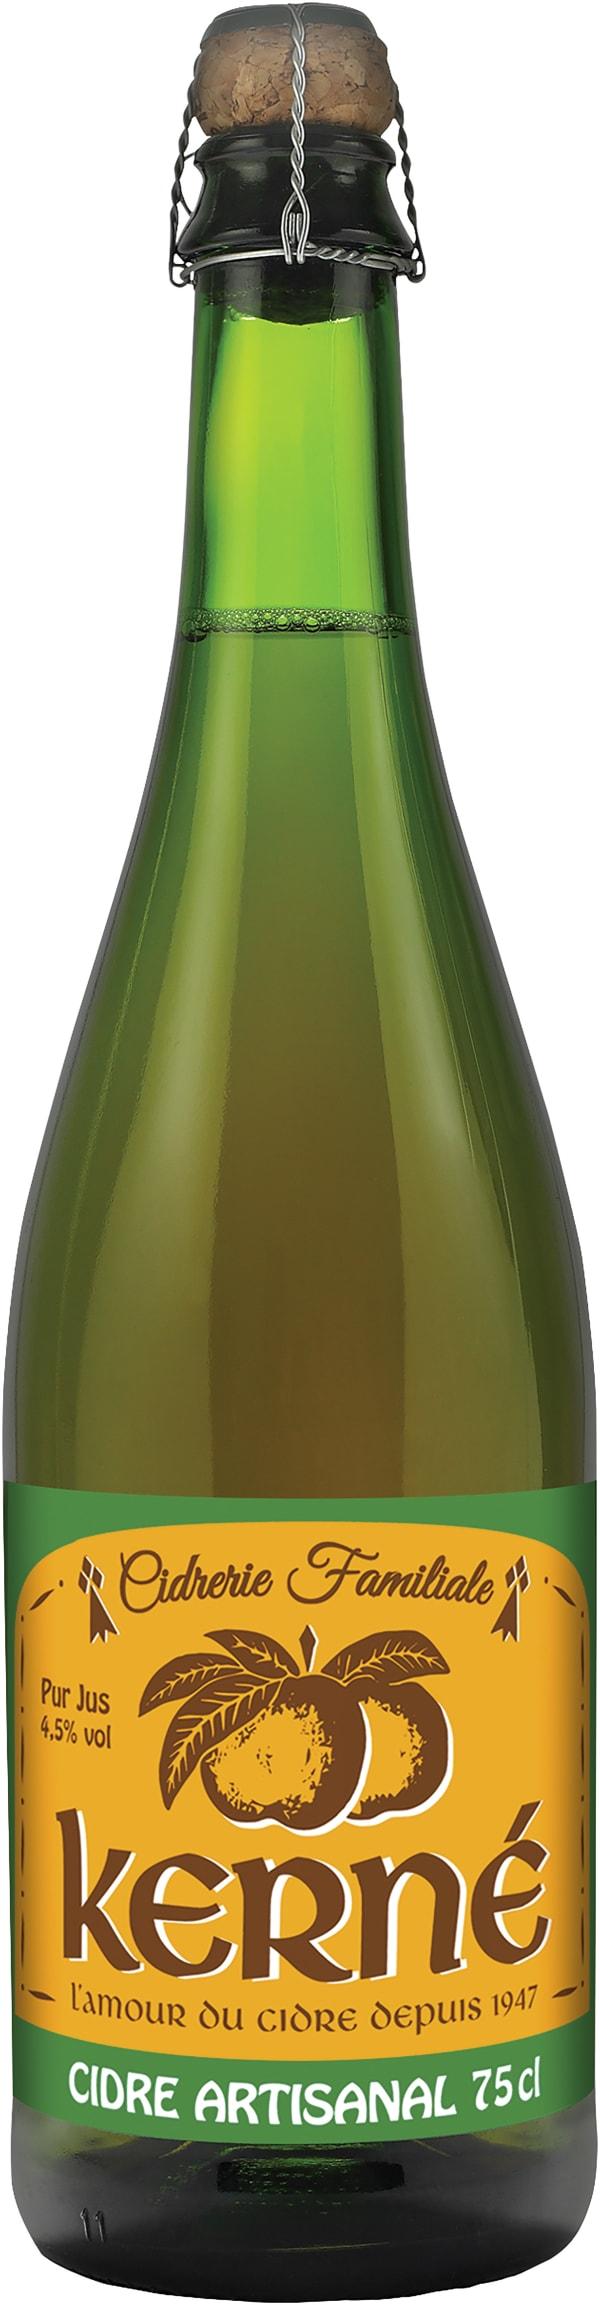 Kerné Cidre Artisanal